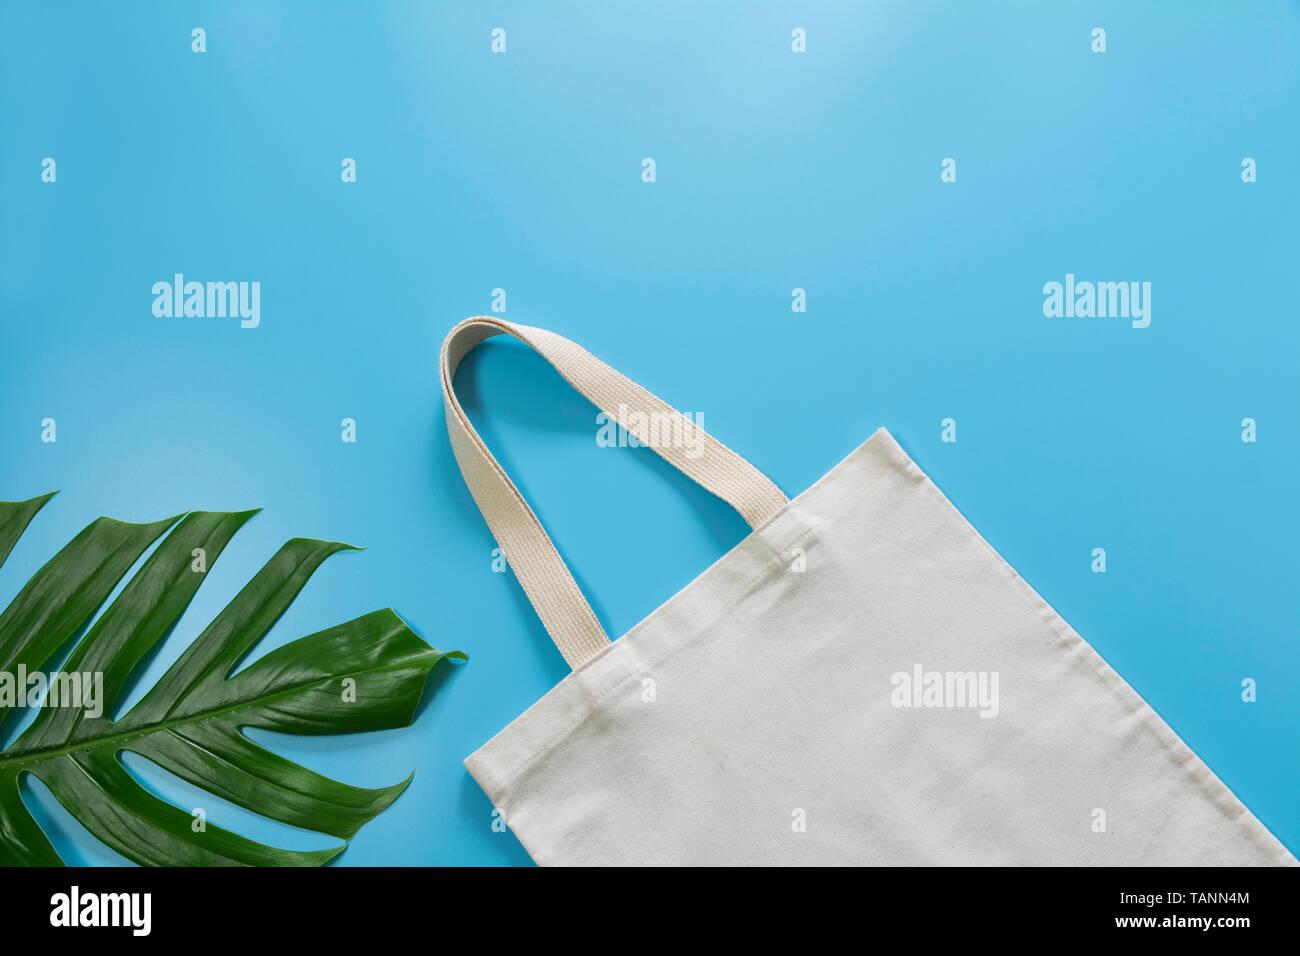 fc2a55b67 Bolsa de tela de lienzo en blanco. Bolsa de compras de tela boceto con  espacio